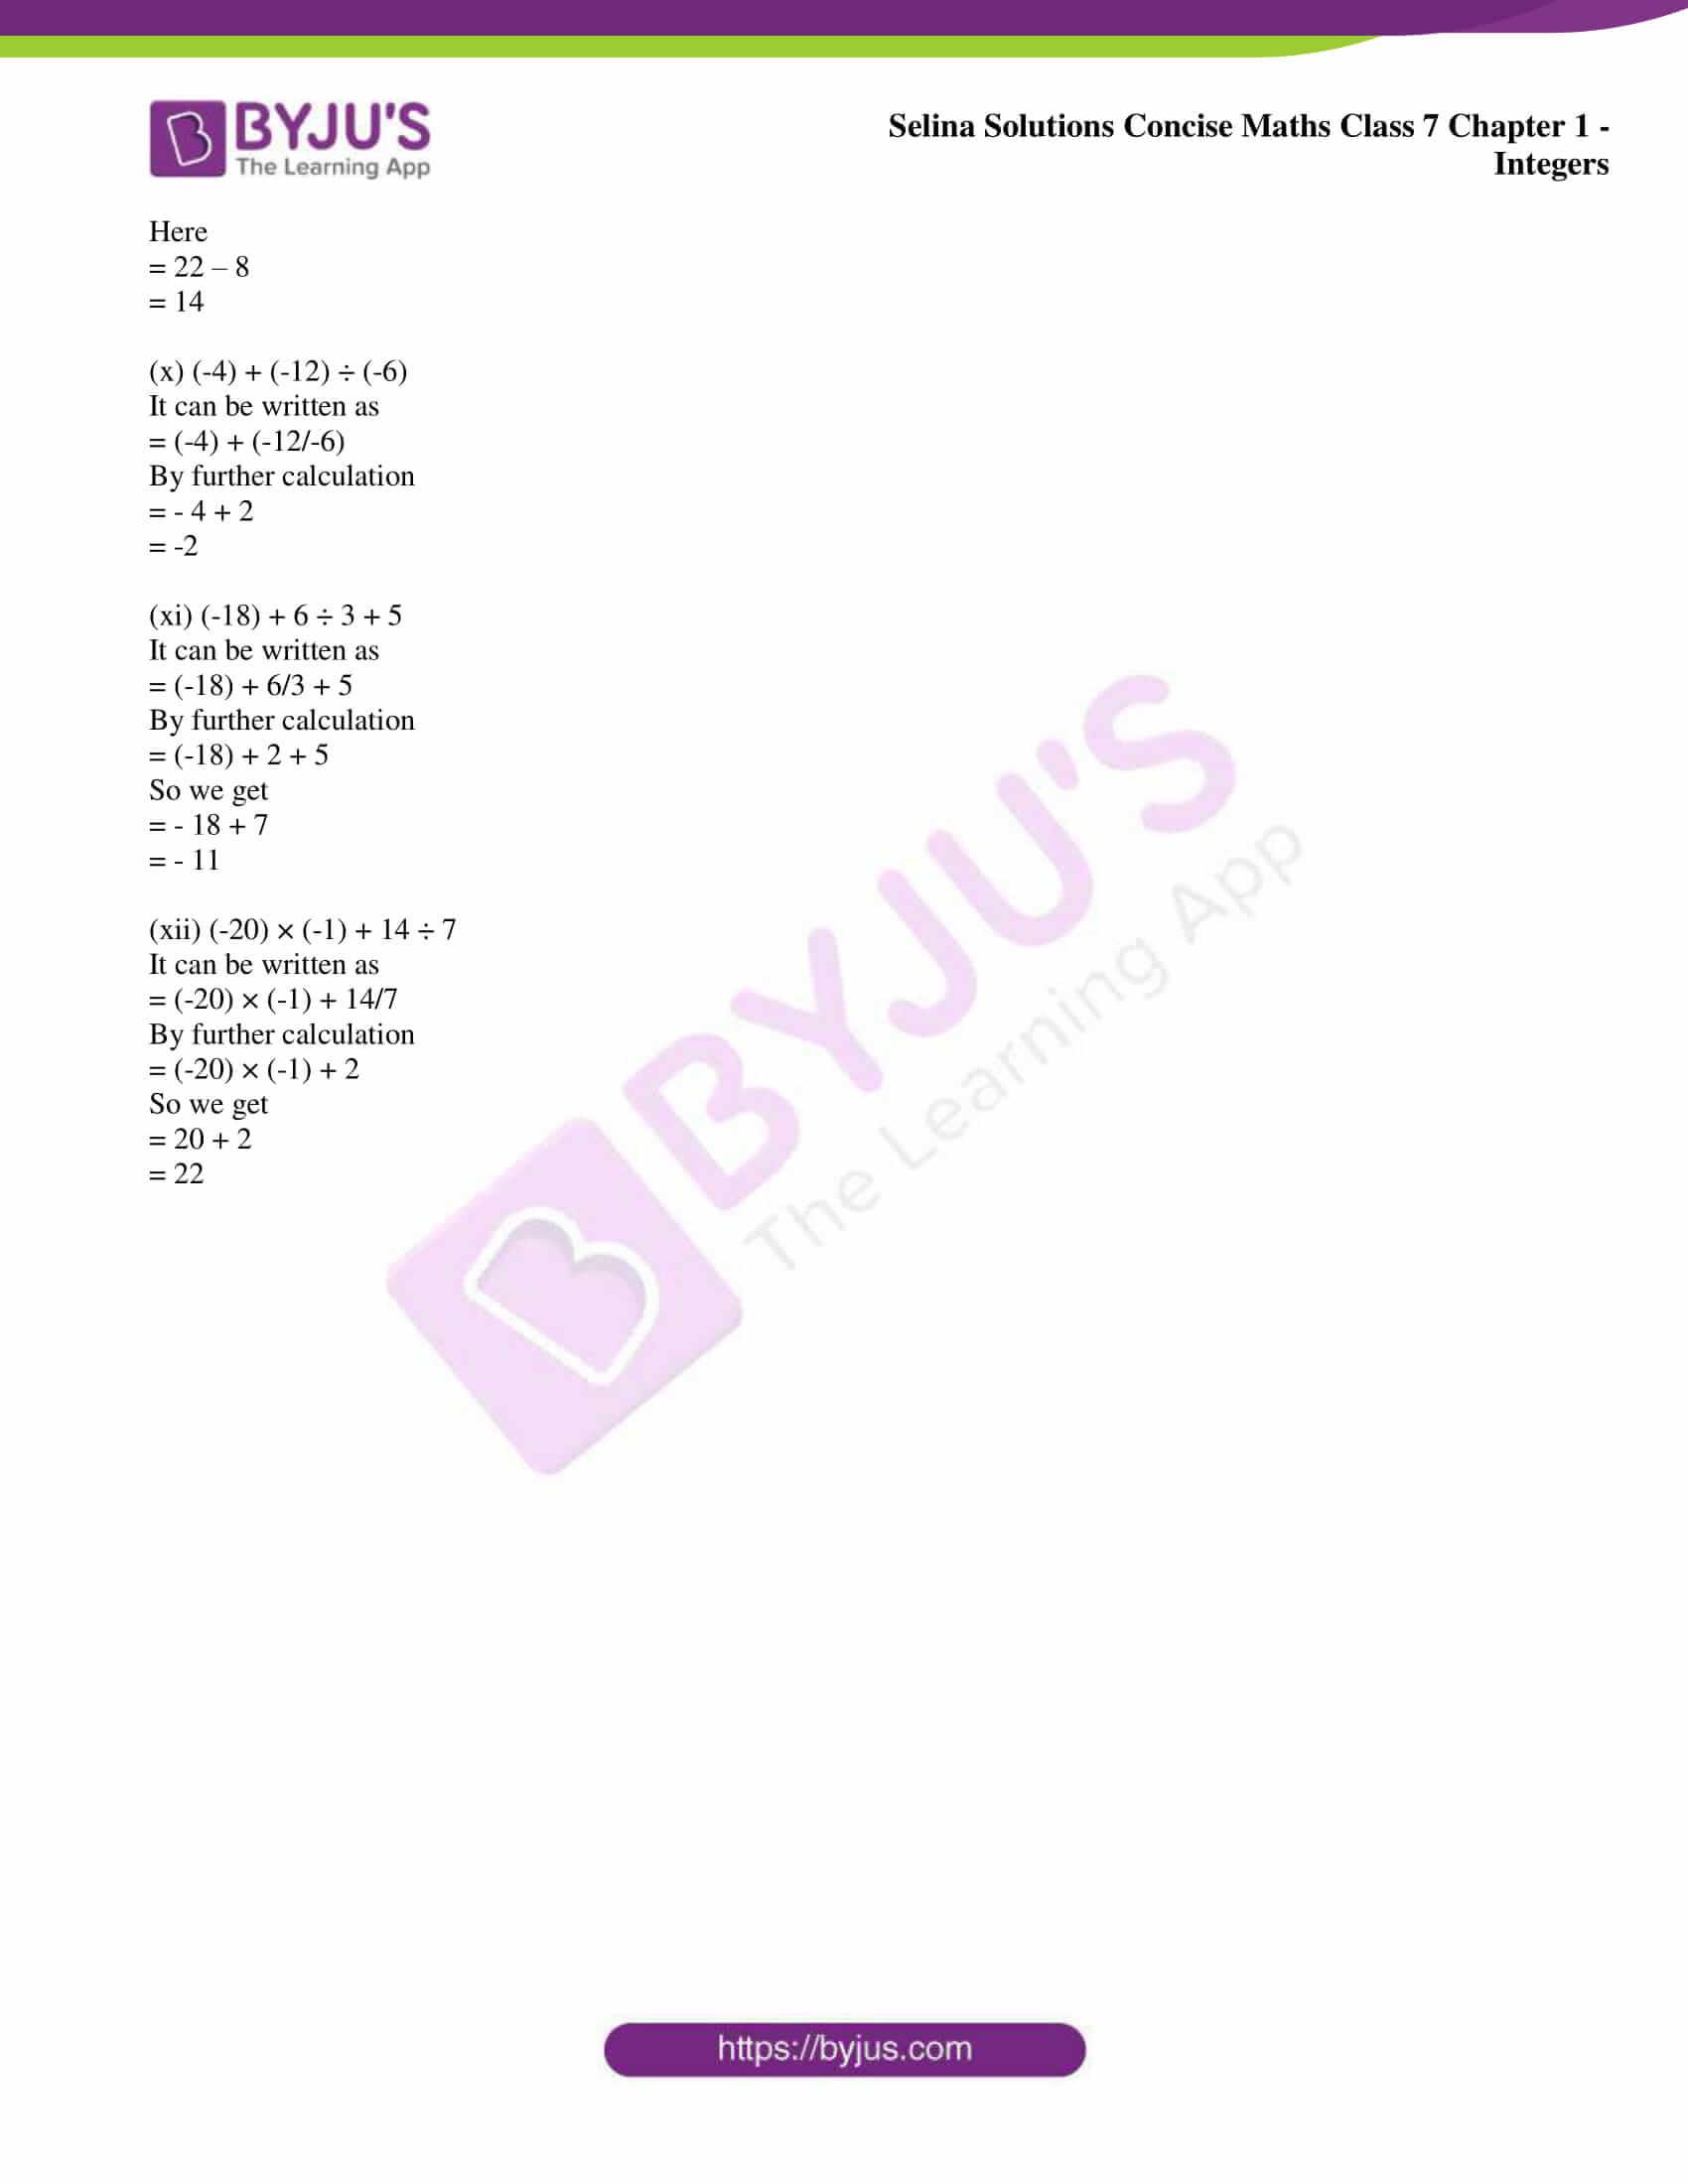 selina sol concise maths class 7 ch1 ex 1b 7